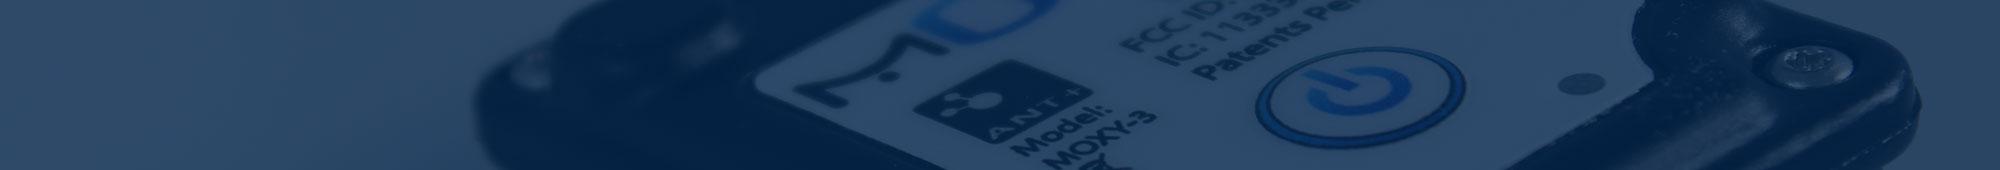 Moxy Device